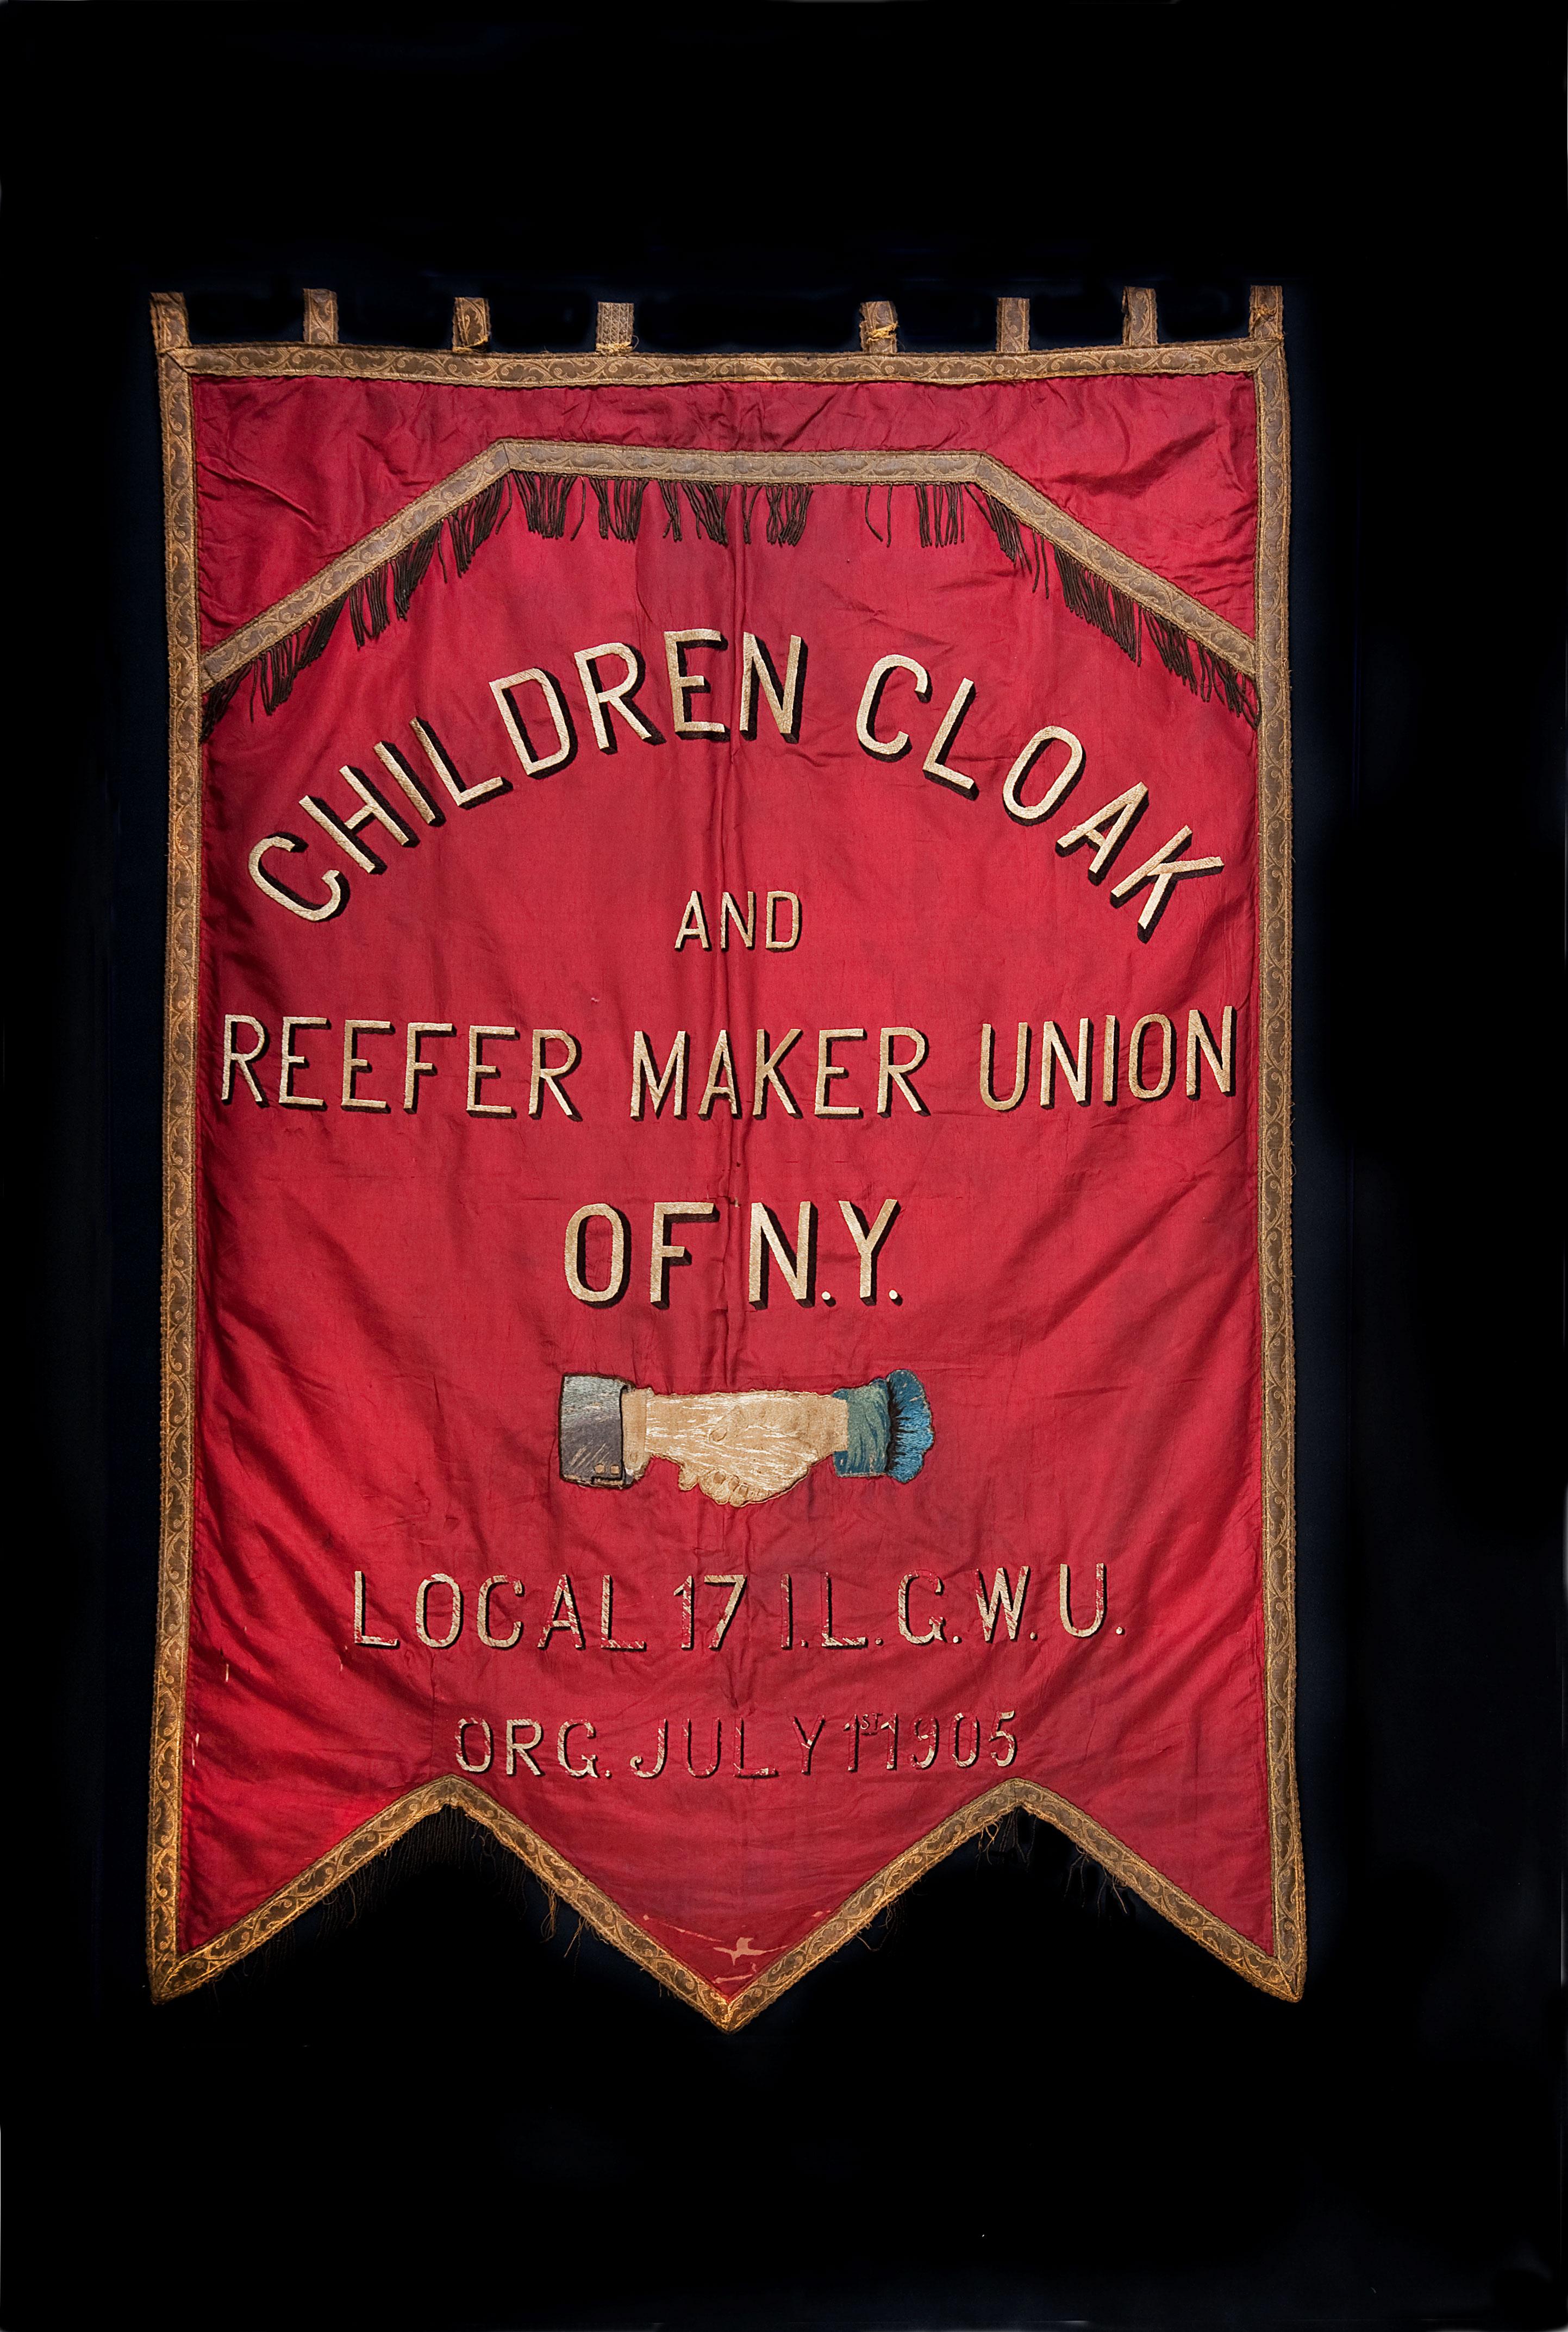 Union banner